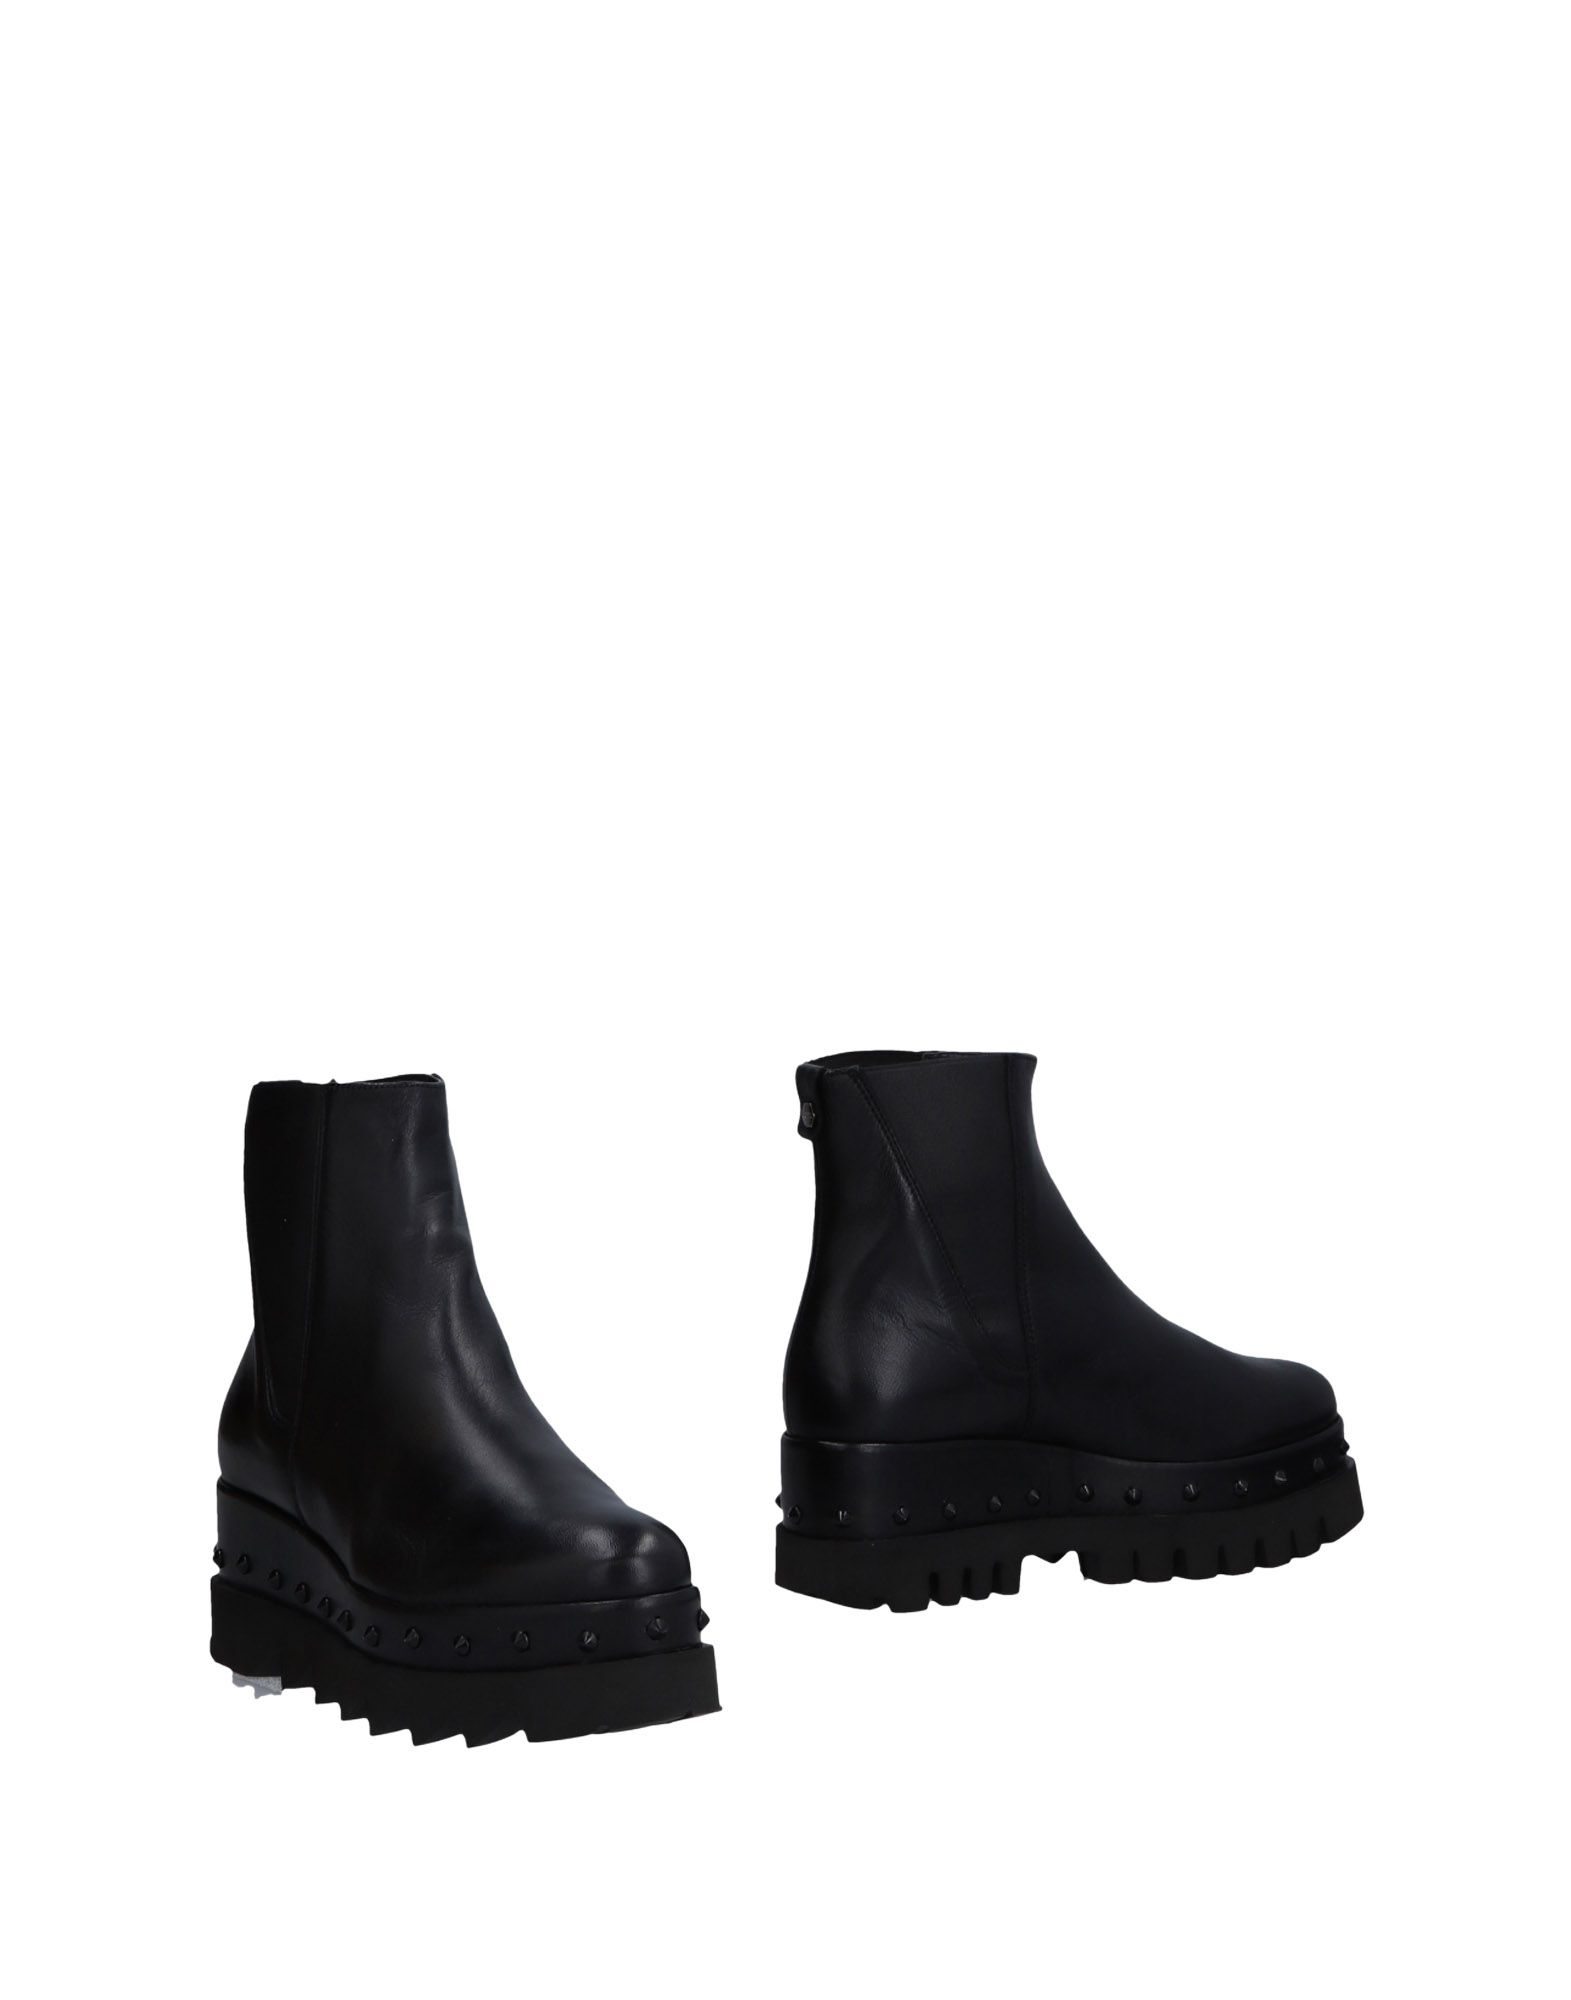 Chelsea Boots Cult Donna - Acquista online su